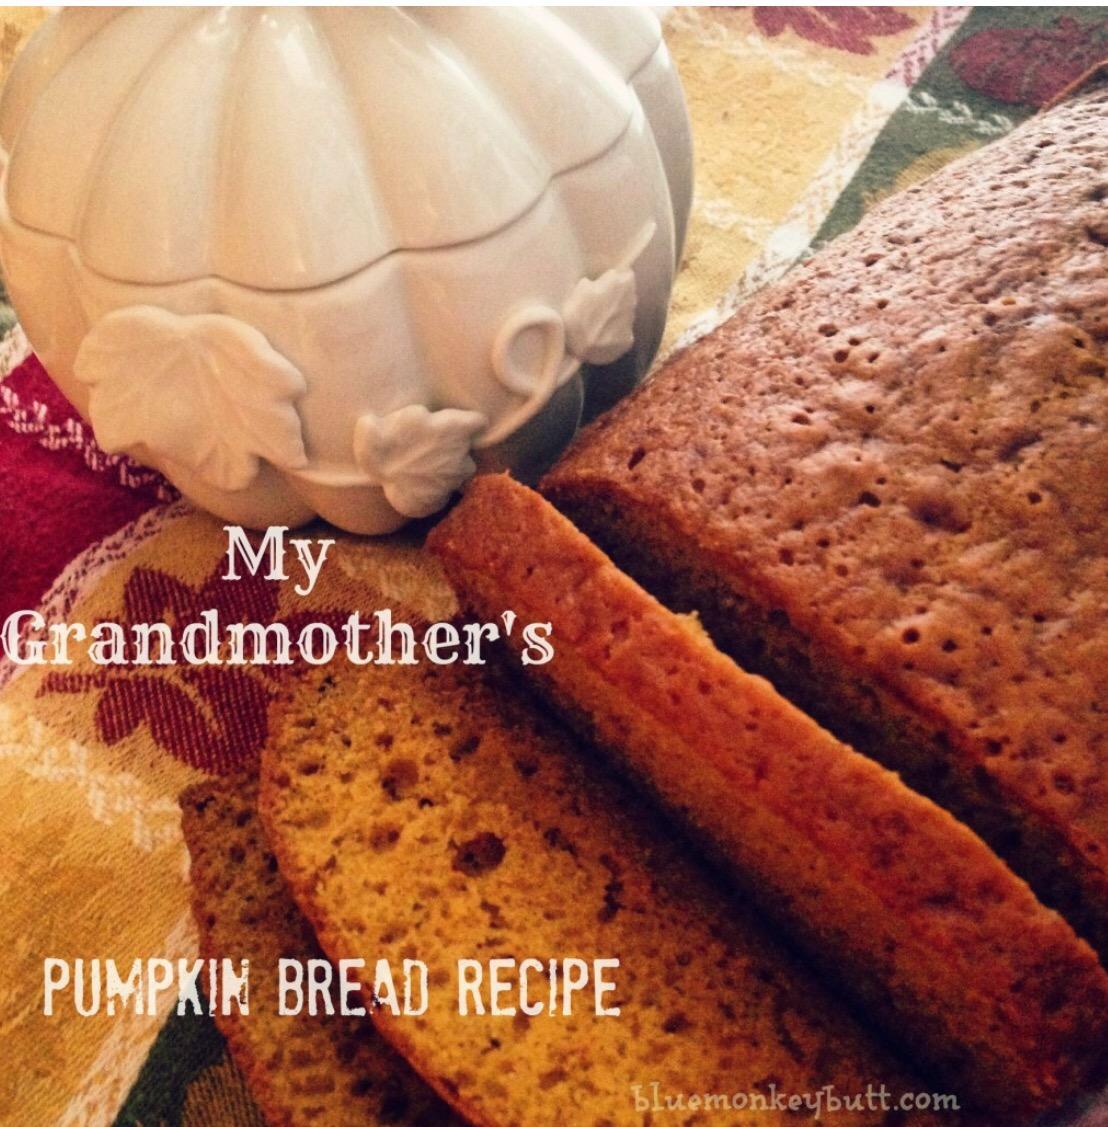 Grandmother's Pumpkin Bread Recipe